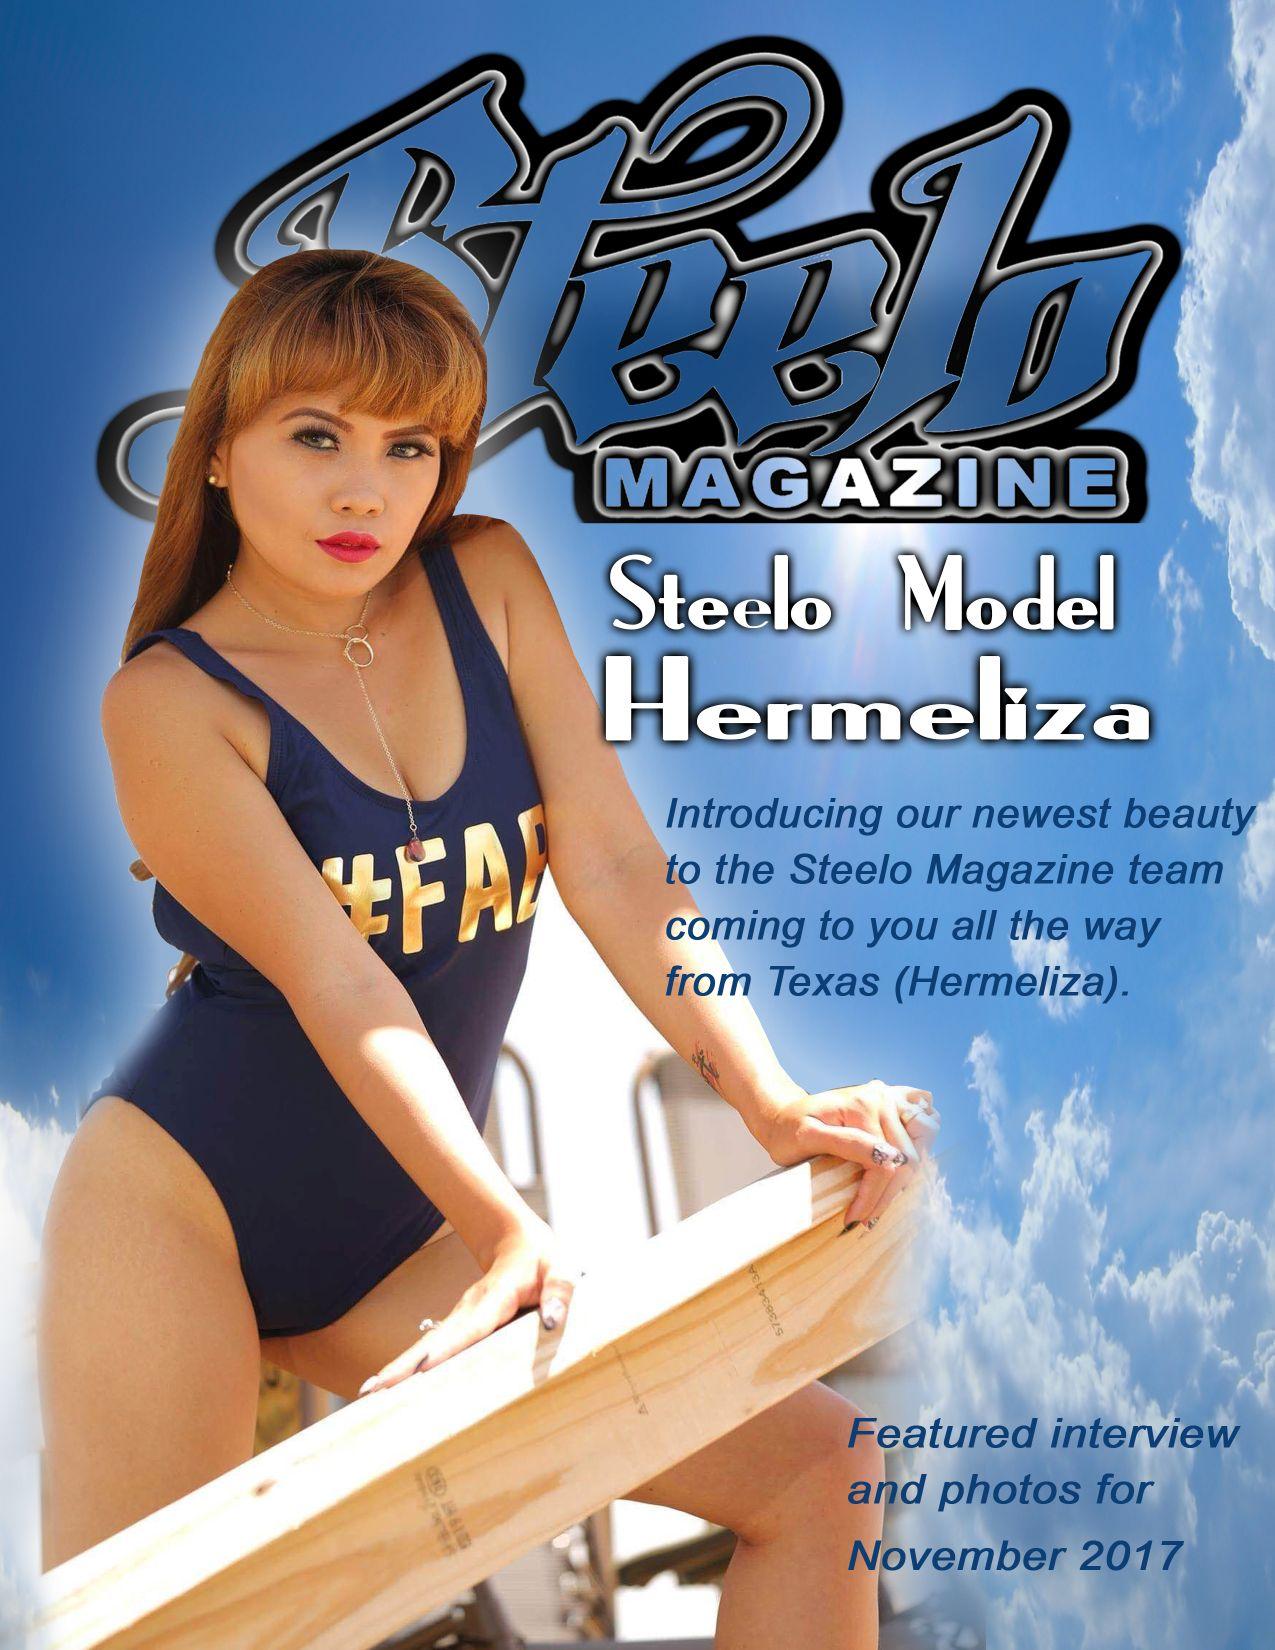 meliza-steelo-model-cover-2